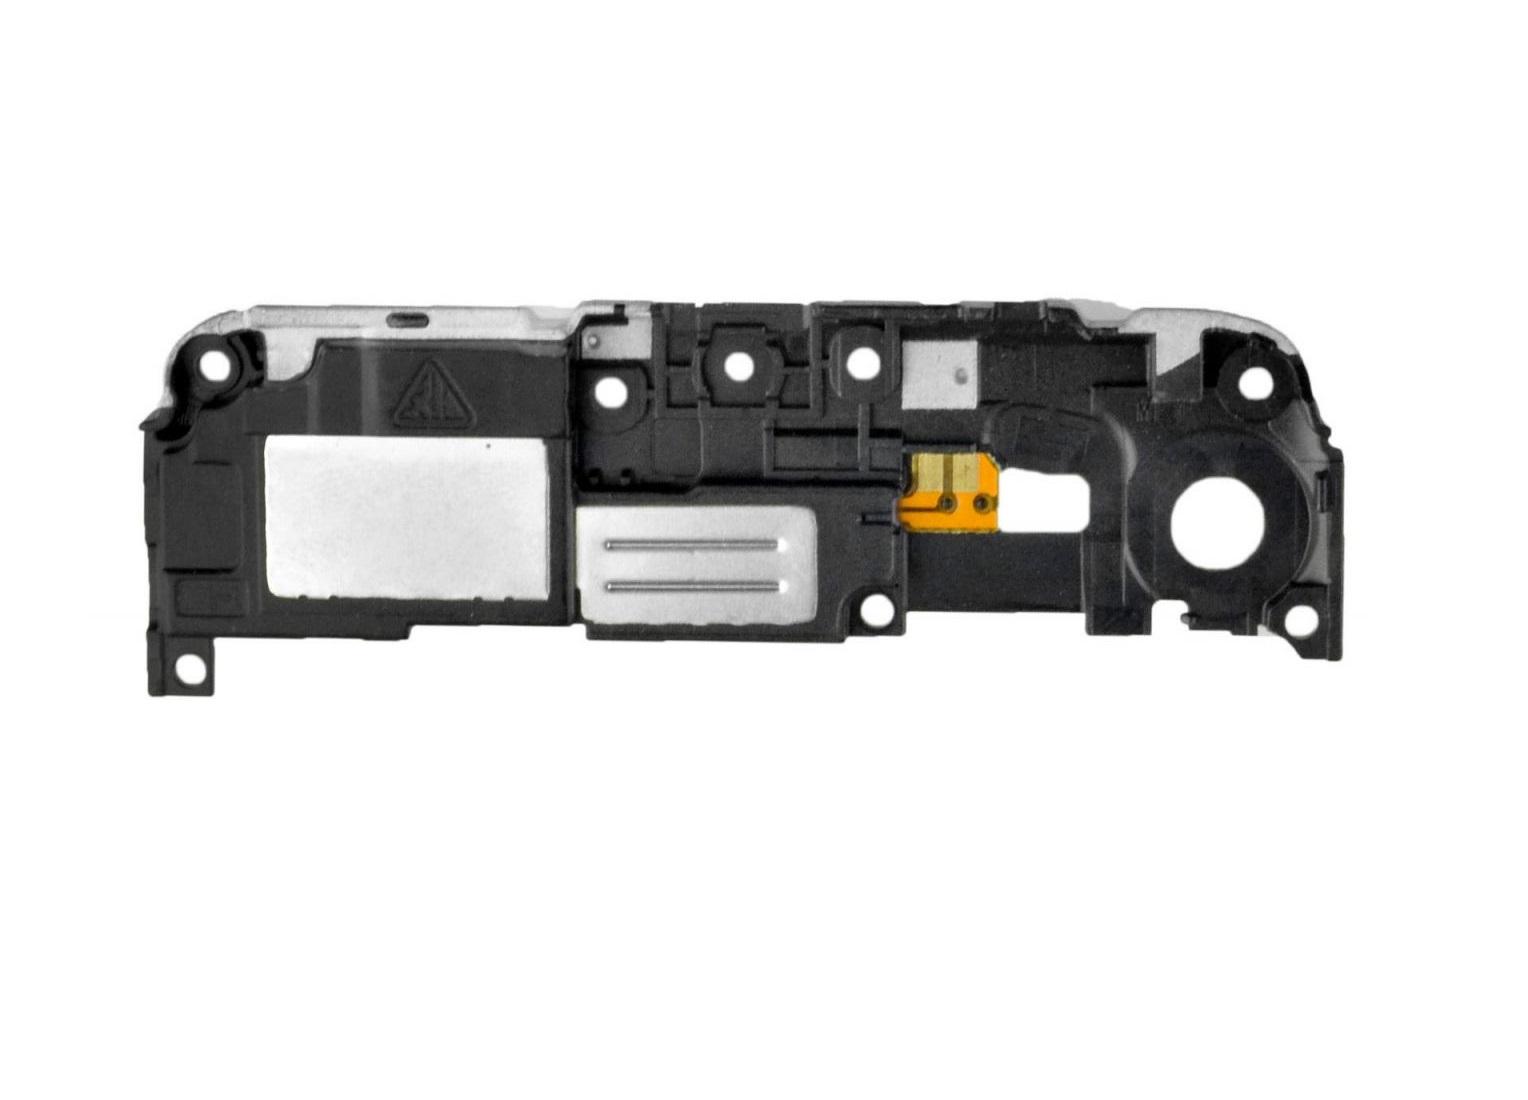 Buzzer Huawei P9 Lite mini,Y6 Pro (2017) with frame